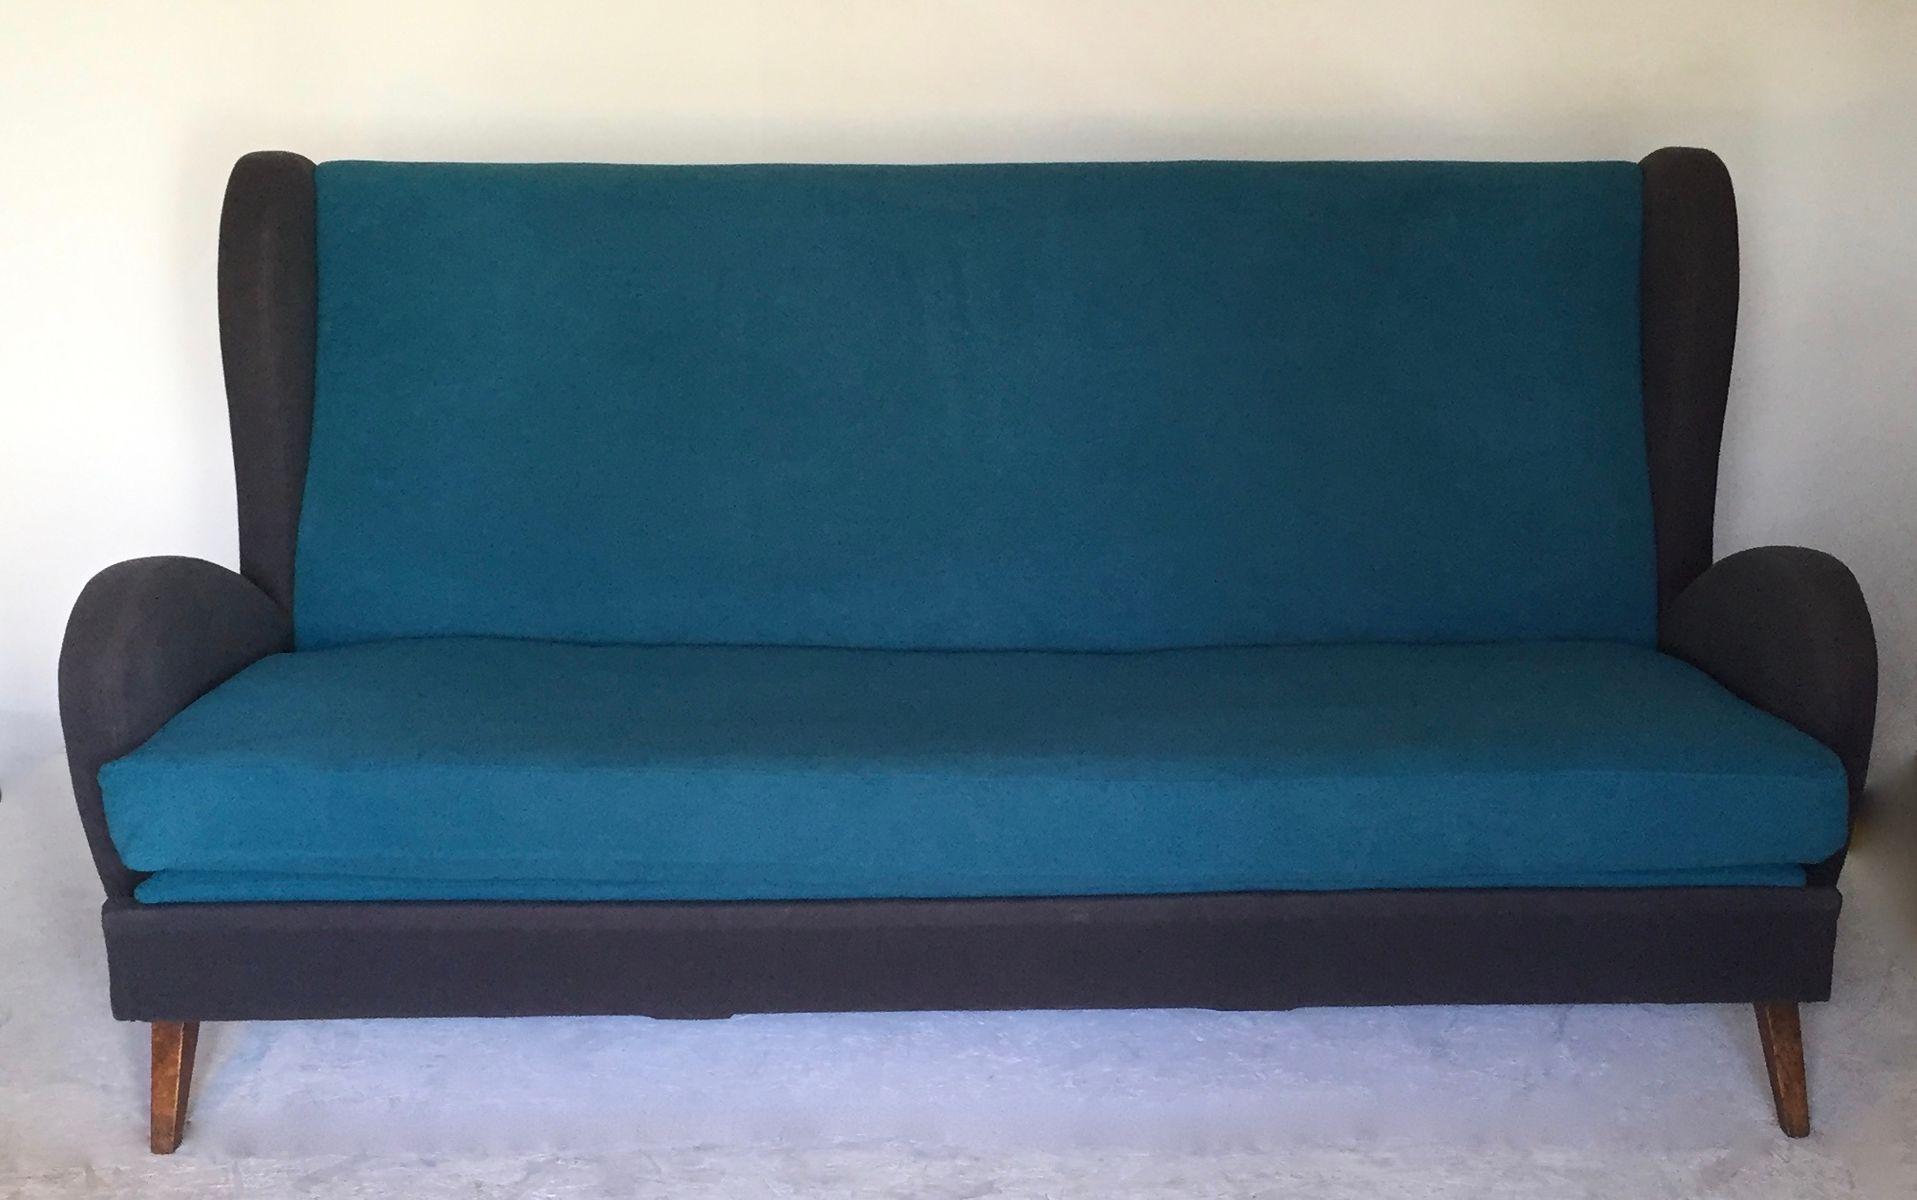 Italian Sofa, 1960s for sale at Pamono